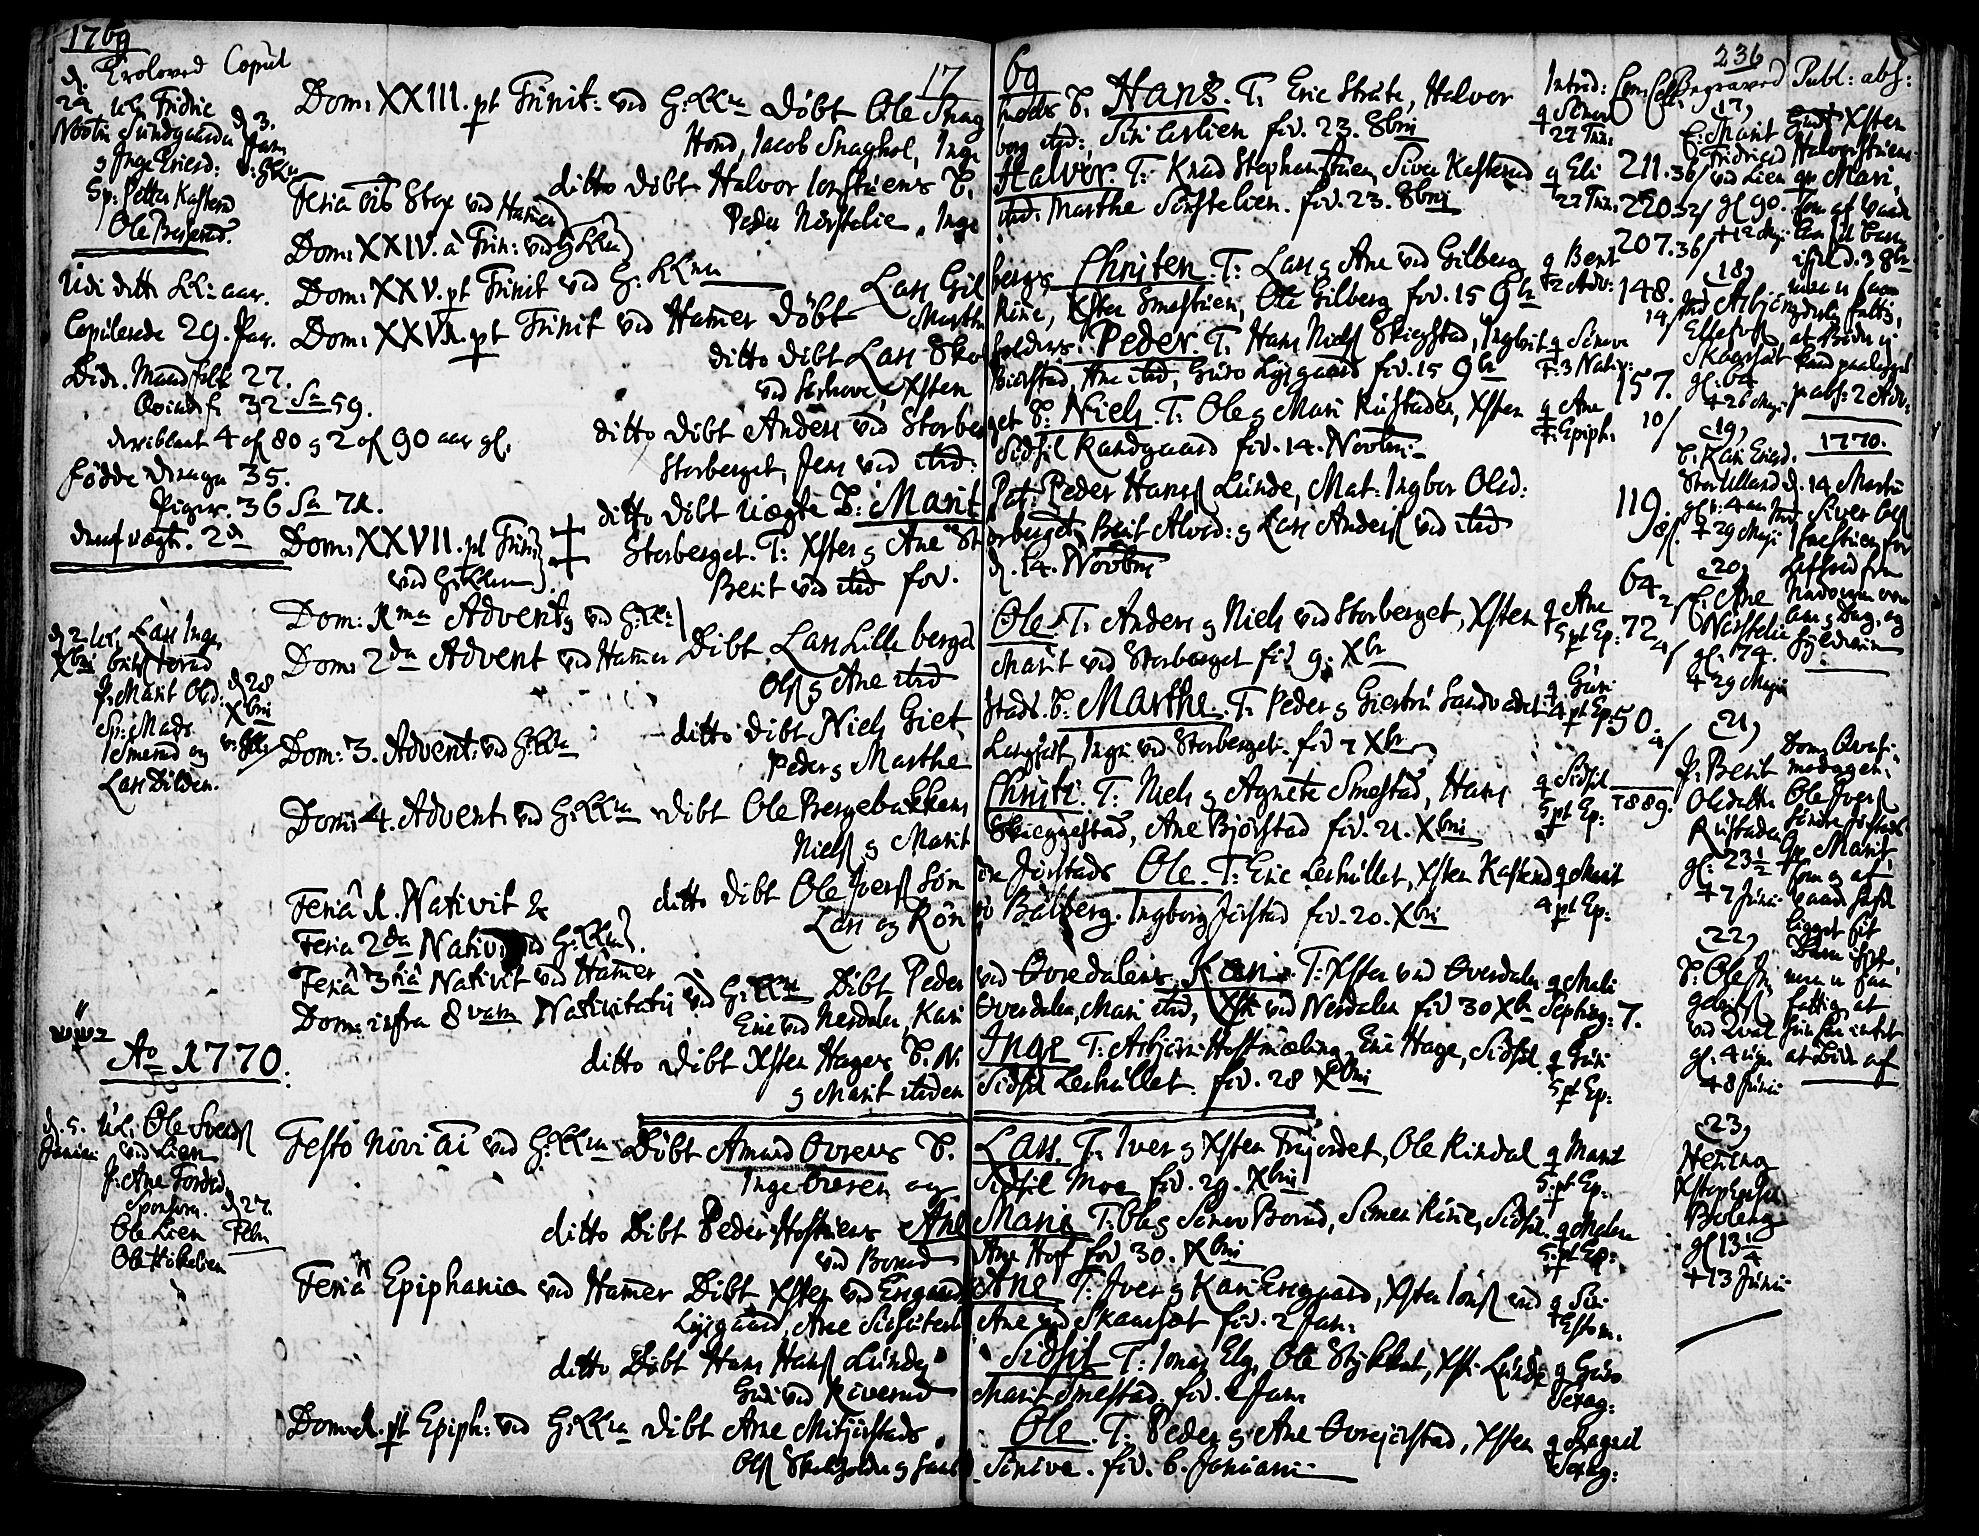 SAH, Fåberg prestekontor, Ministerialbok nr. 1, 1727-1775, s. 236